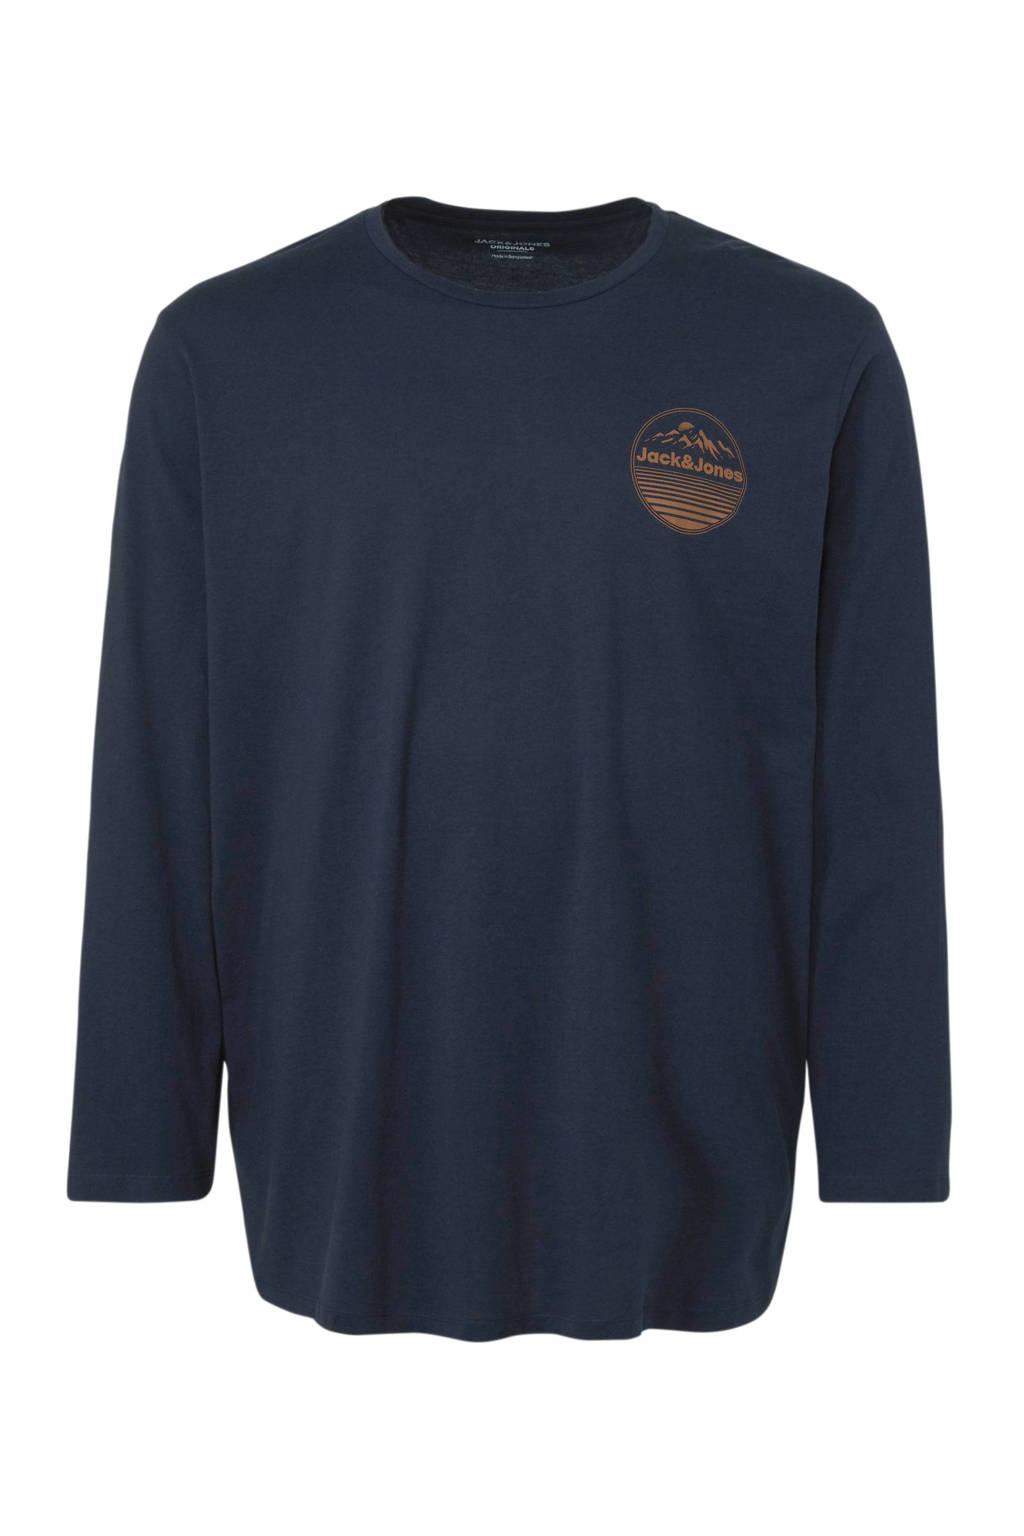 JACK & JONES PLUS SIZE T-shirt met tekst donkerblauw, Donkerblauw